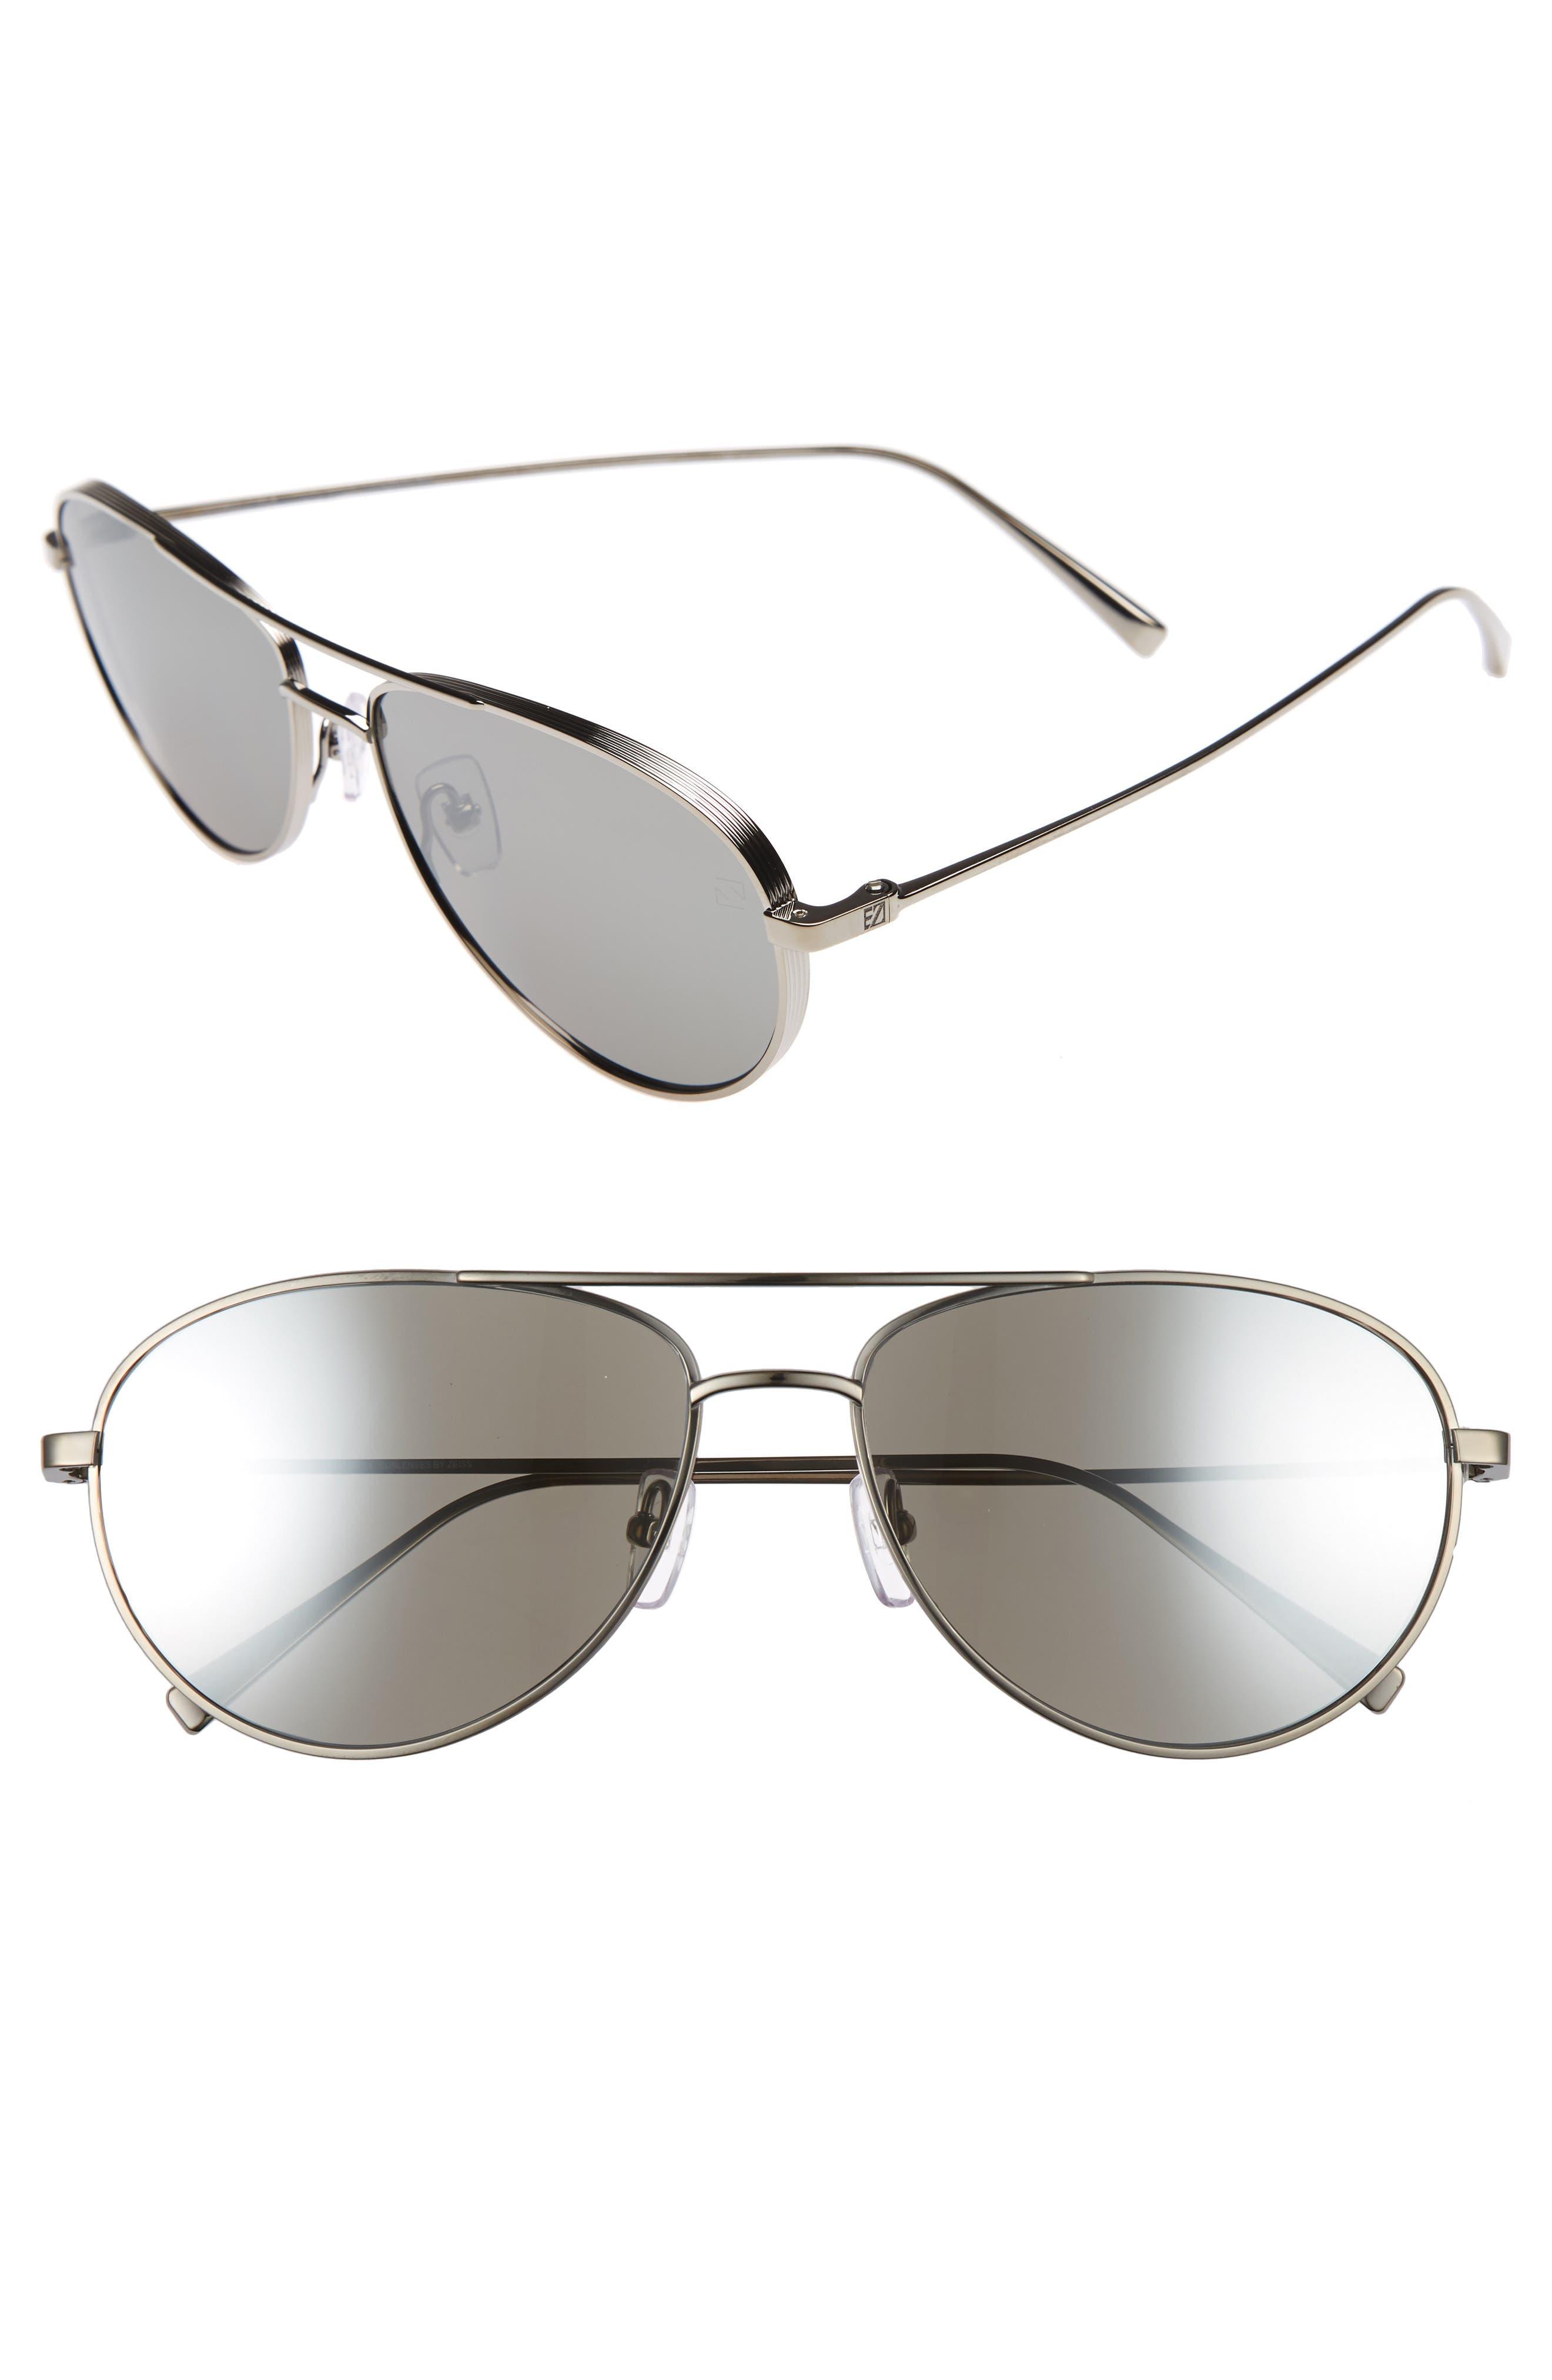 ERMENEGILDO ZEGNA 59mm Aviator Sunglasses